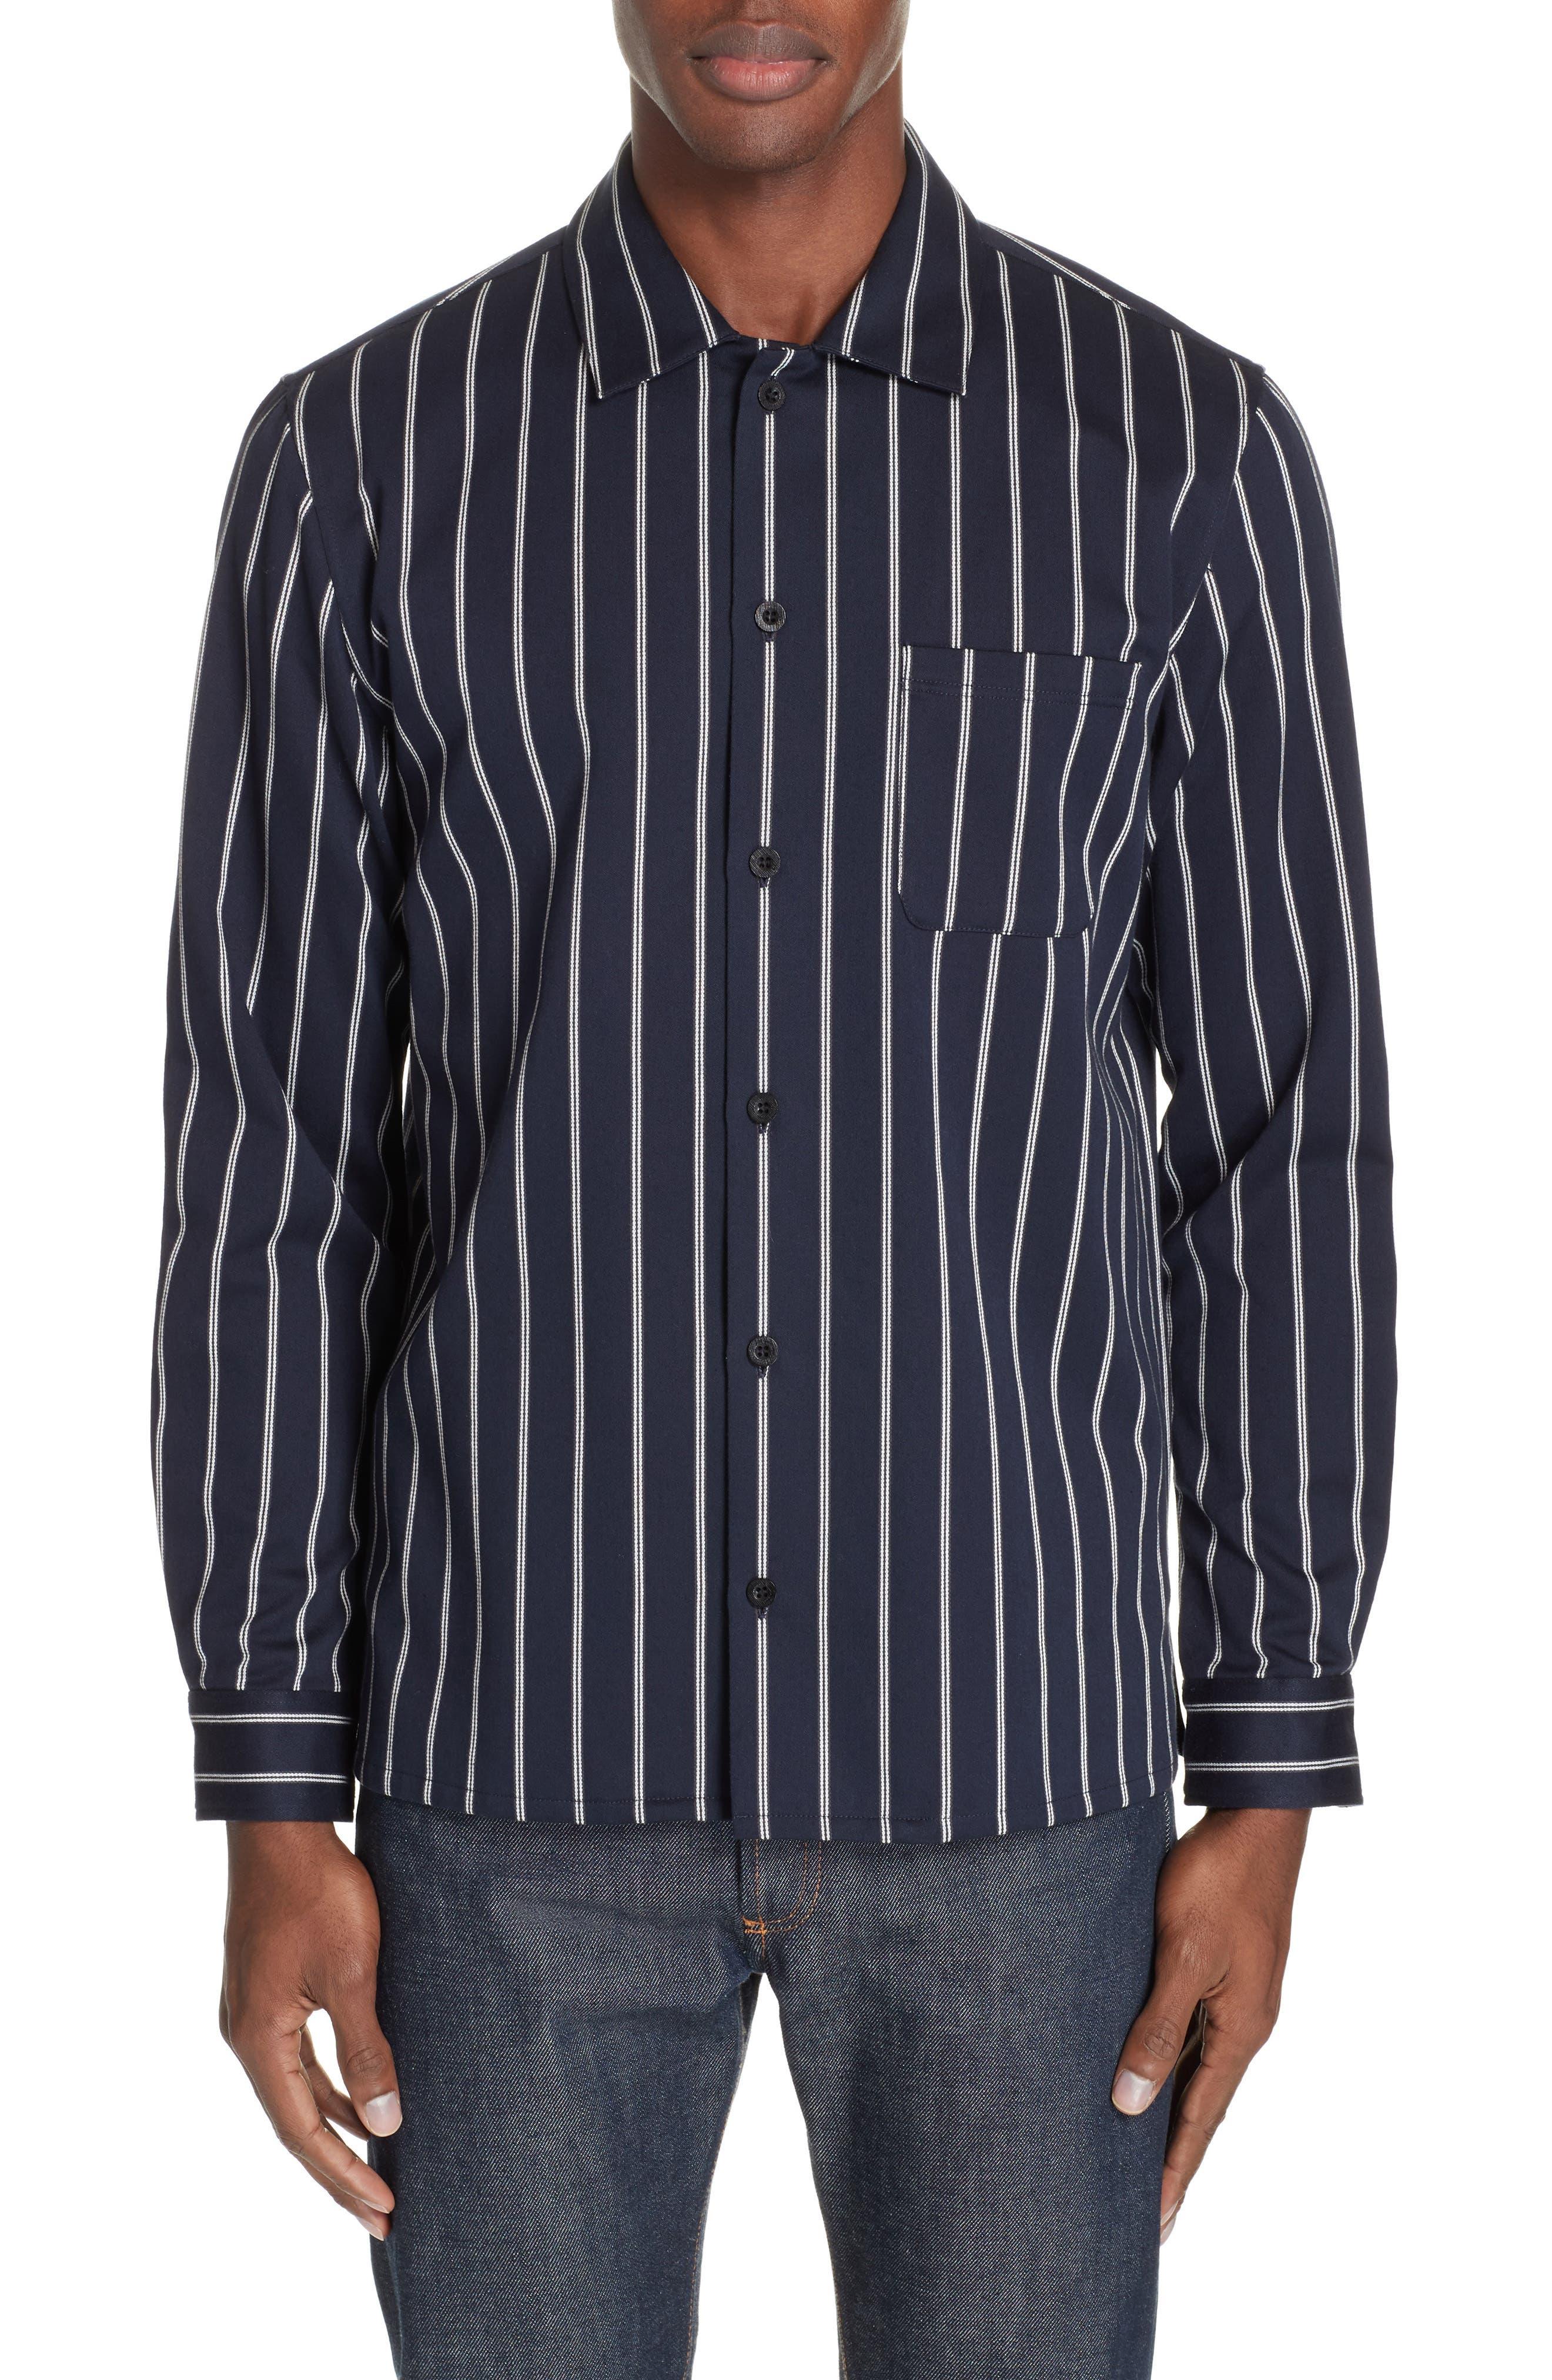 Mint Stripe Extra Slim Fit Sport Shirt, Main, color, DARK NAVY